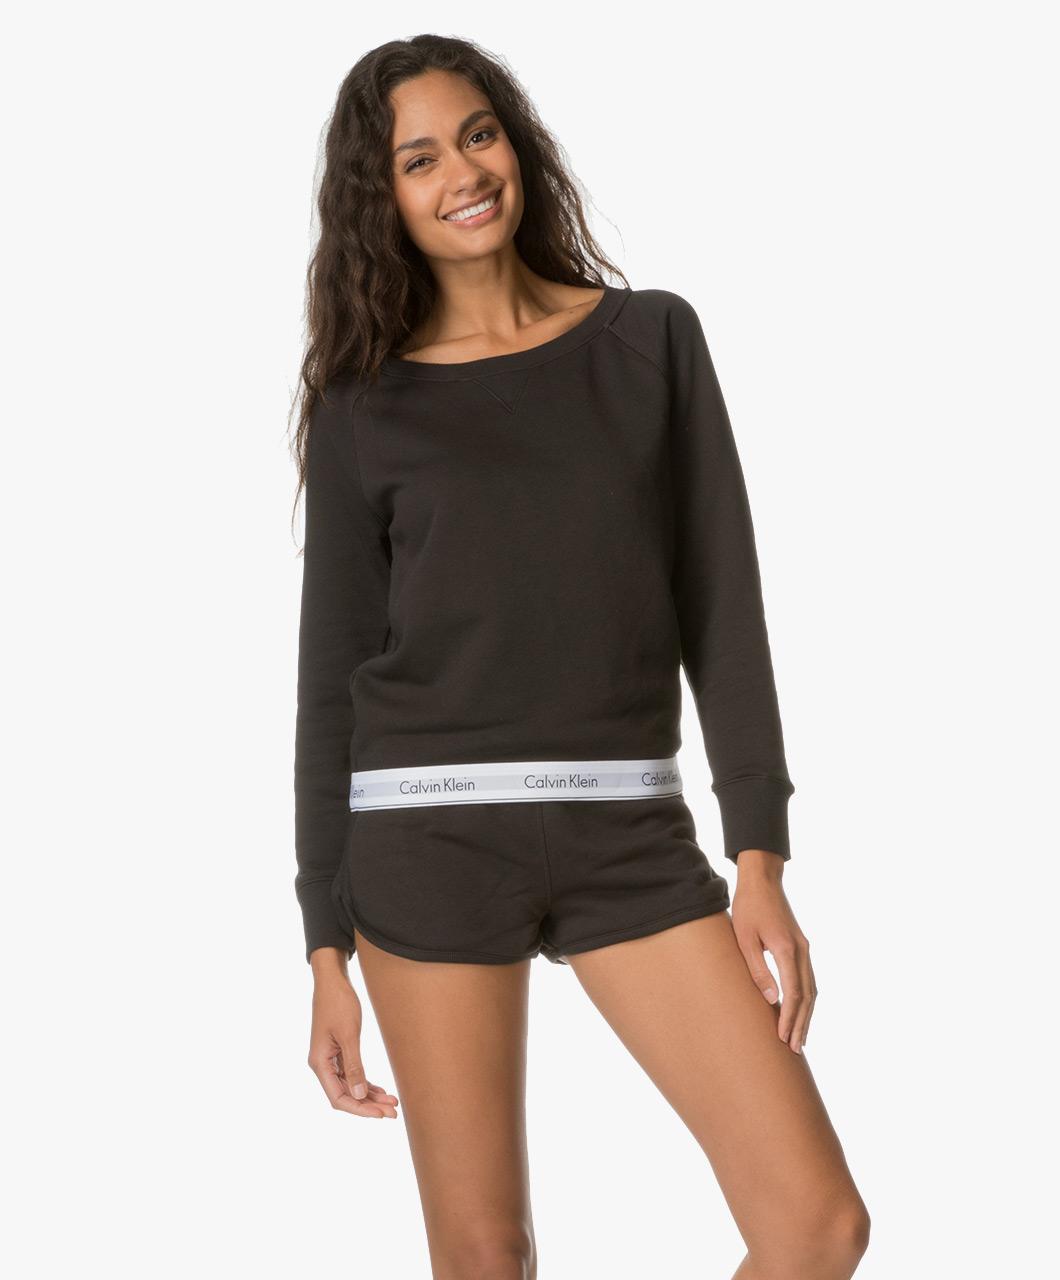 calvin klein modern cotton sweater black qs5718e 001. Black Bedroom Furniture Sets. Home Design Ideas